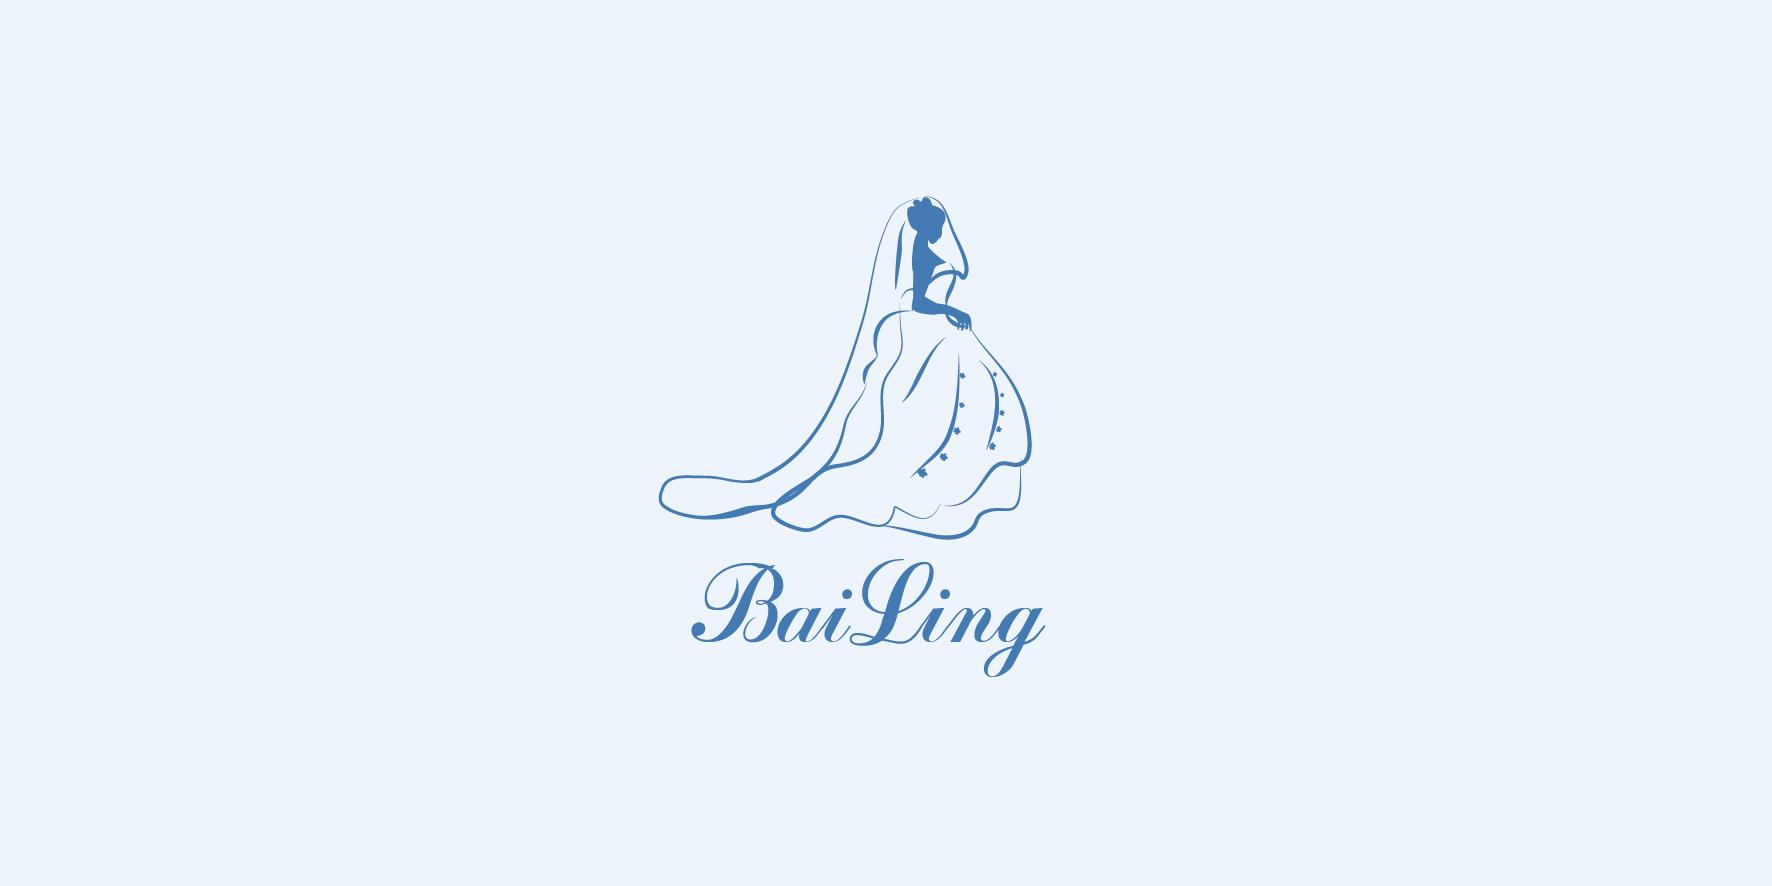 高档婚纱品牌logo